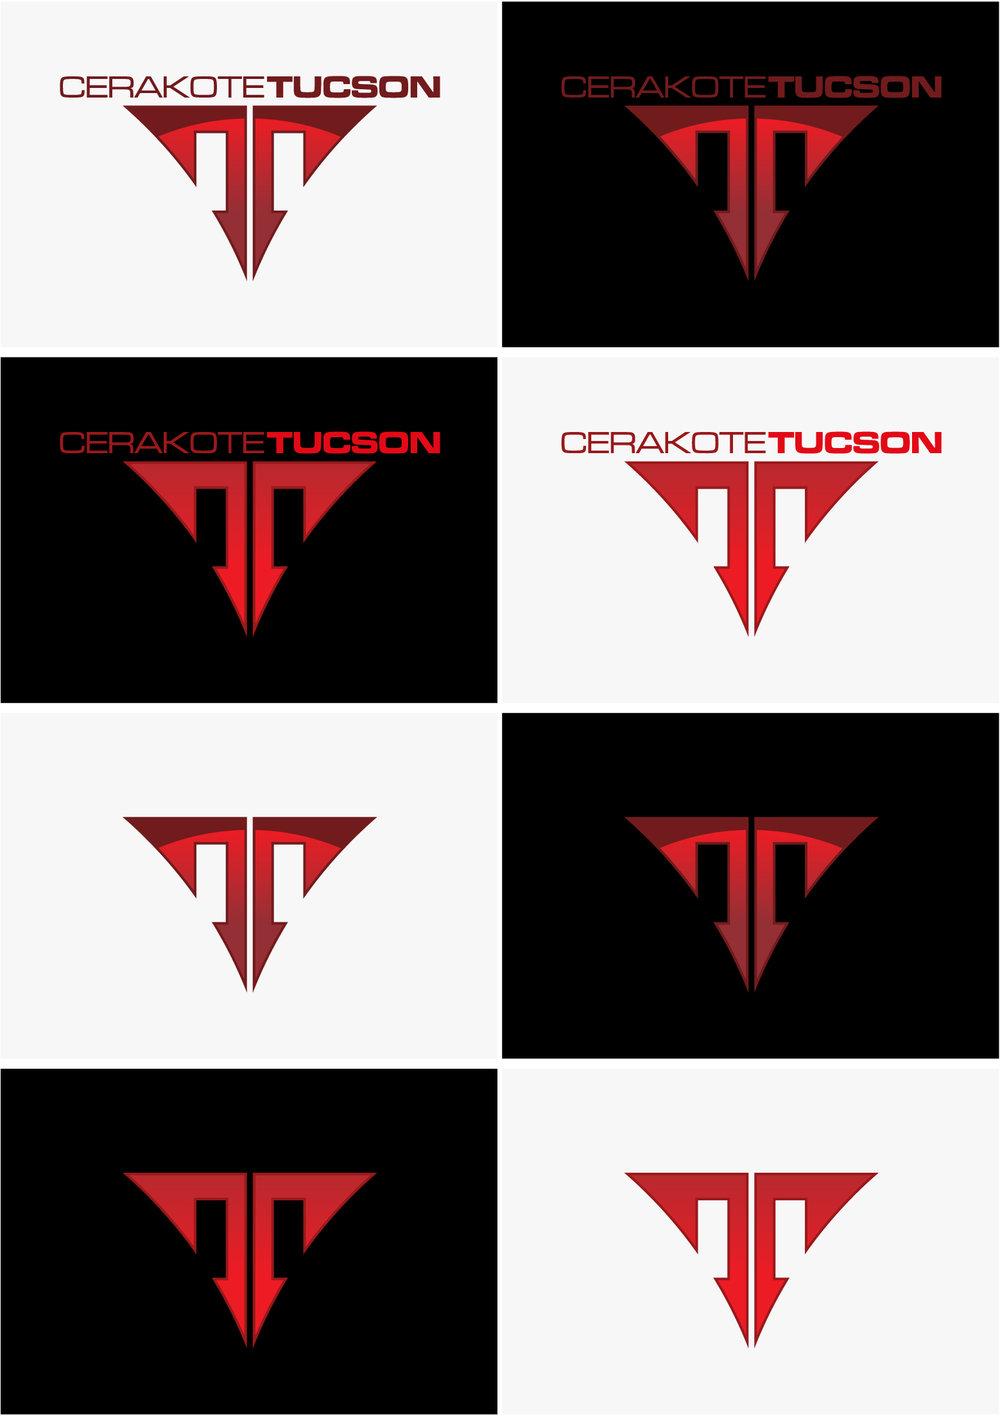 logo-custom lettering-cerakote tucson-sweyda.jpg